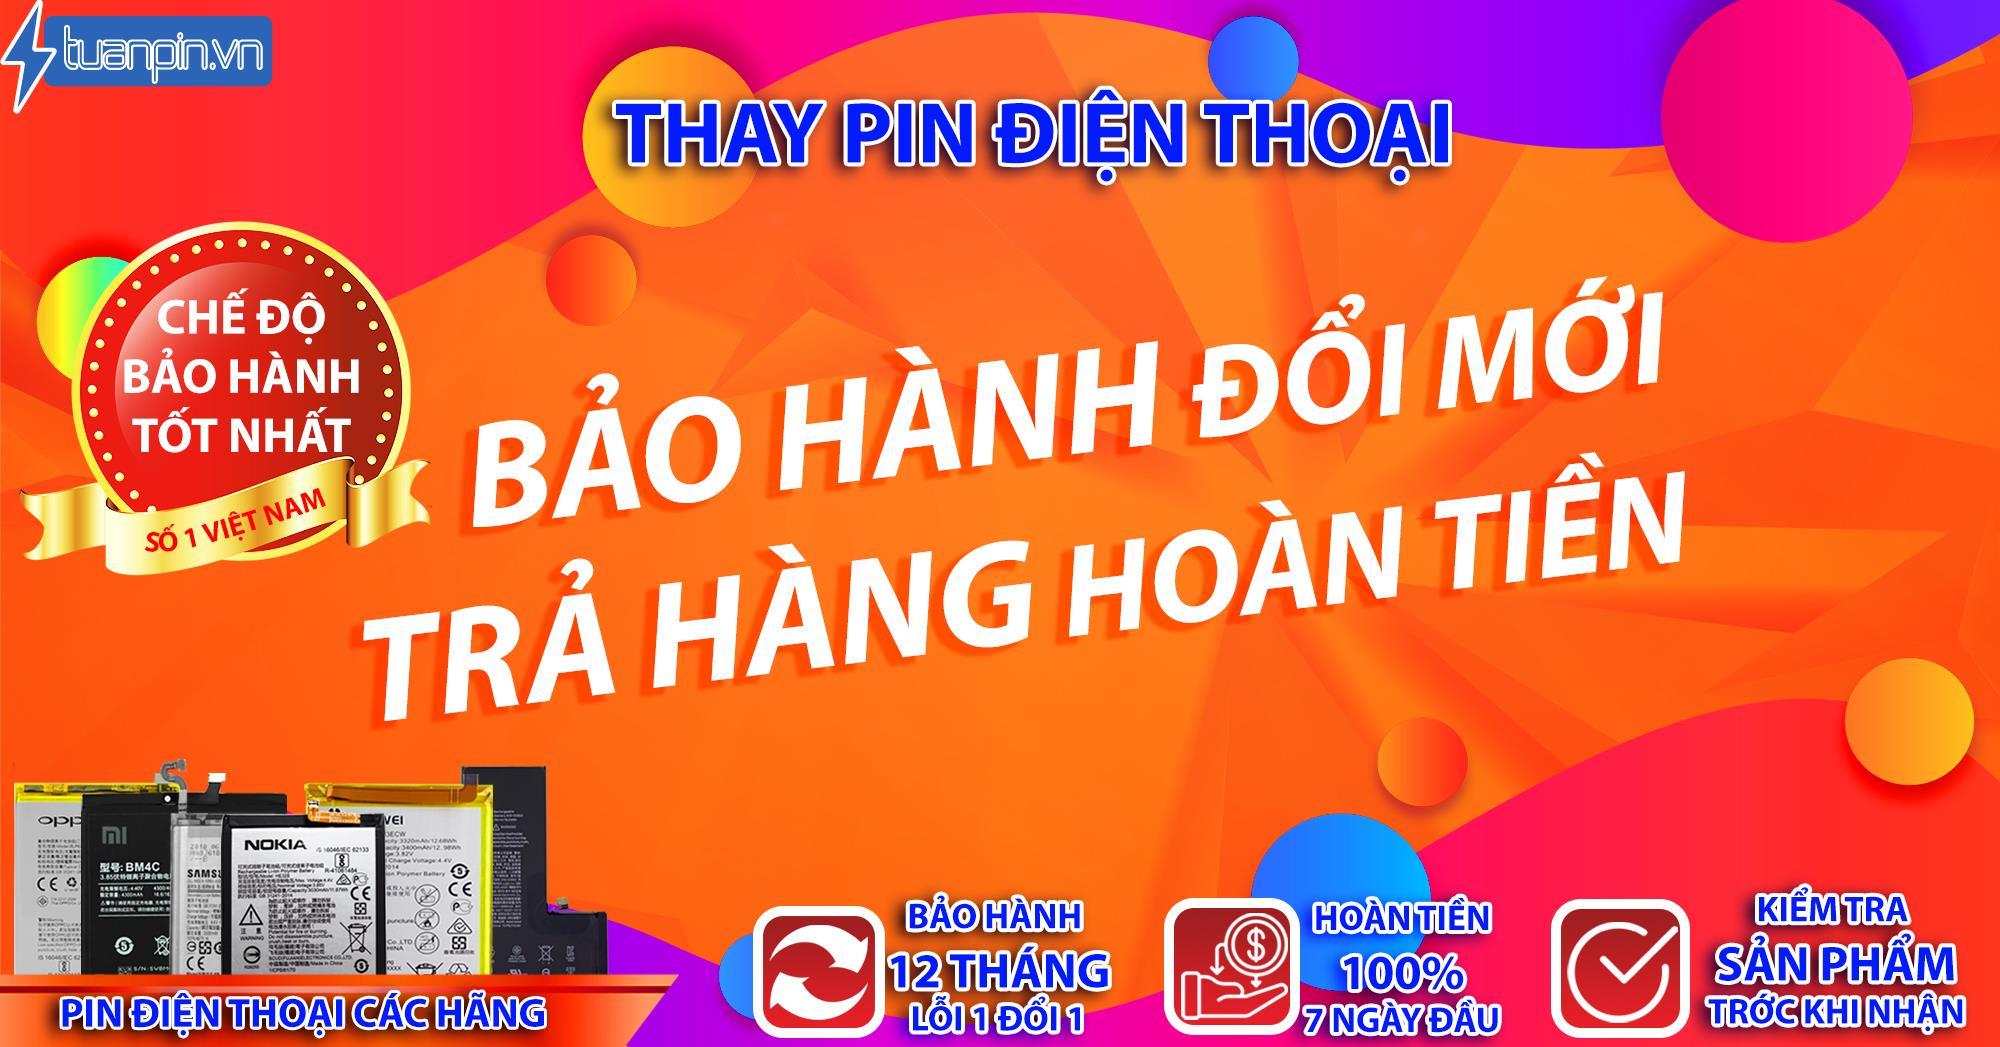 bao-hanh-12-thang-loi-1-doi-1-tra-hang-hoan-tien